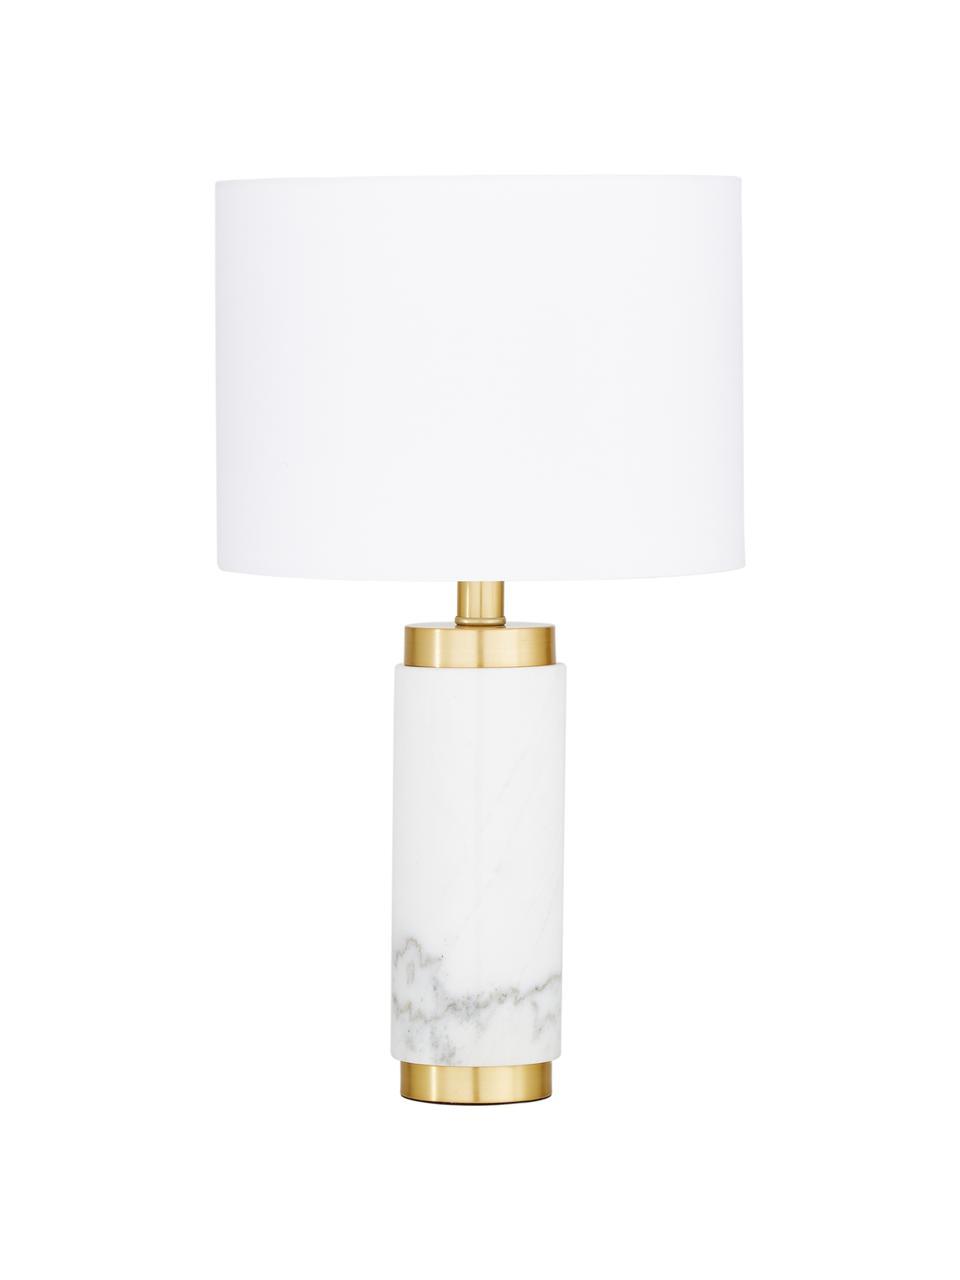 Glam tafellamp Miranda met marmeren voet, Lampenkap: textiel, Lampvoet: marmer, geborsteld messin, Wit, messingkleurig, Ø 28 x H 48 cm